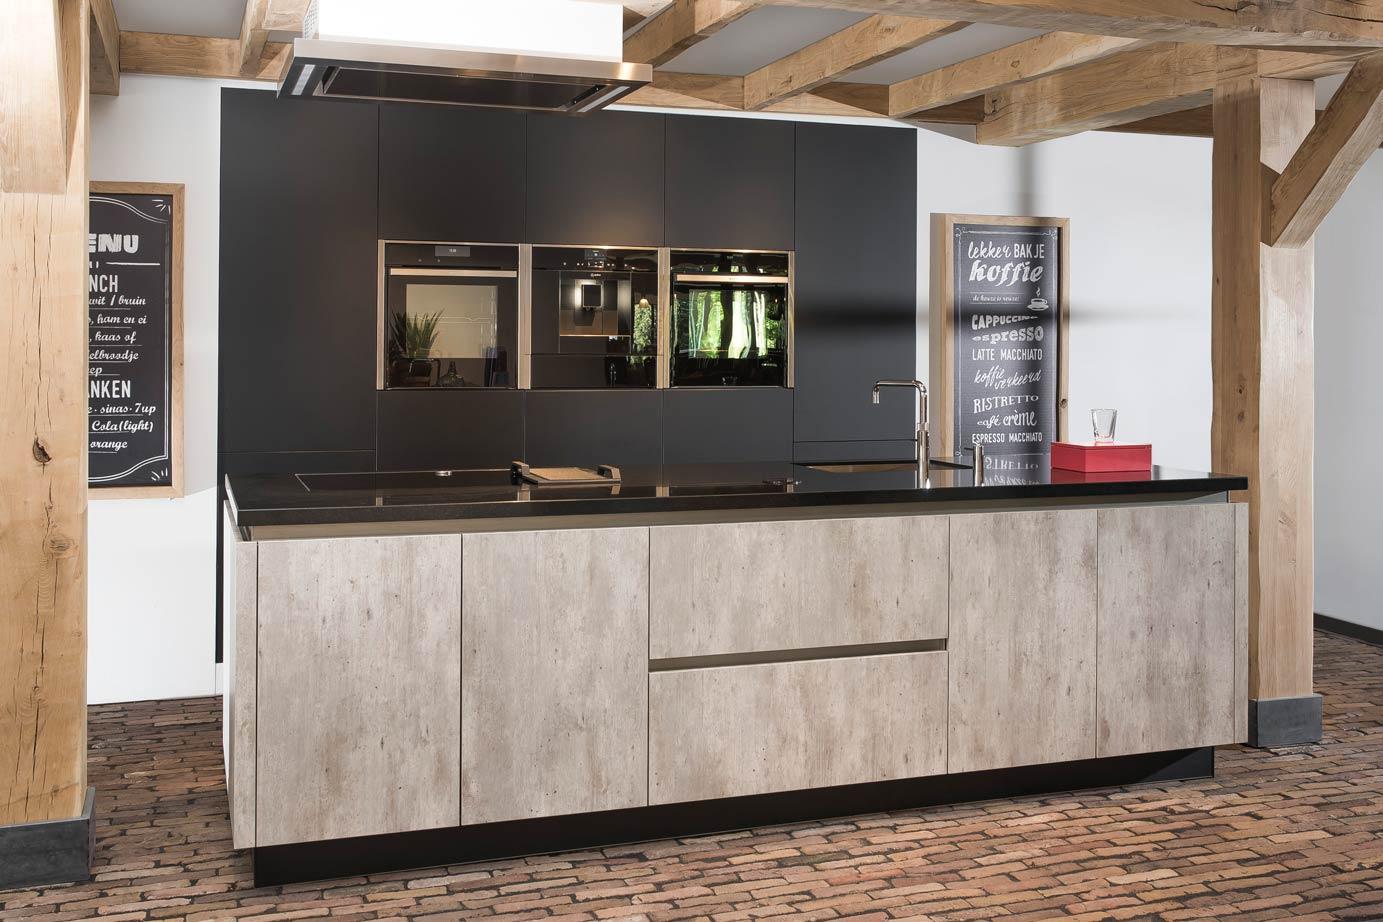 Greeploze Keuken Kookeiland : Landelijk moderne kookeiland met kastenwand DB Keukens